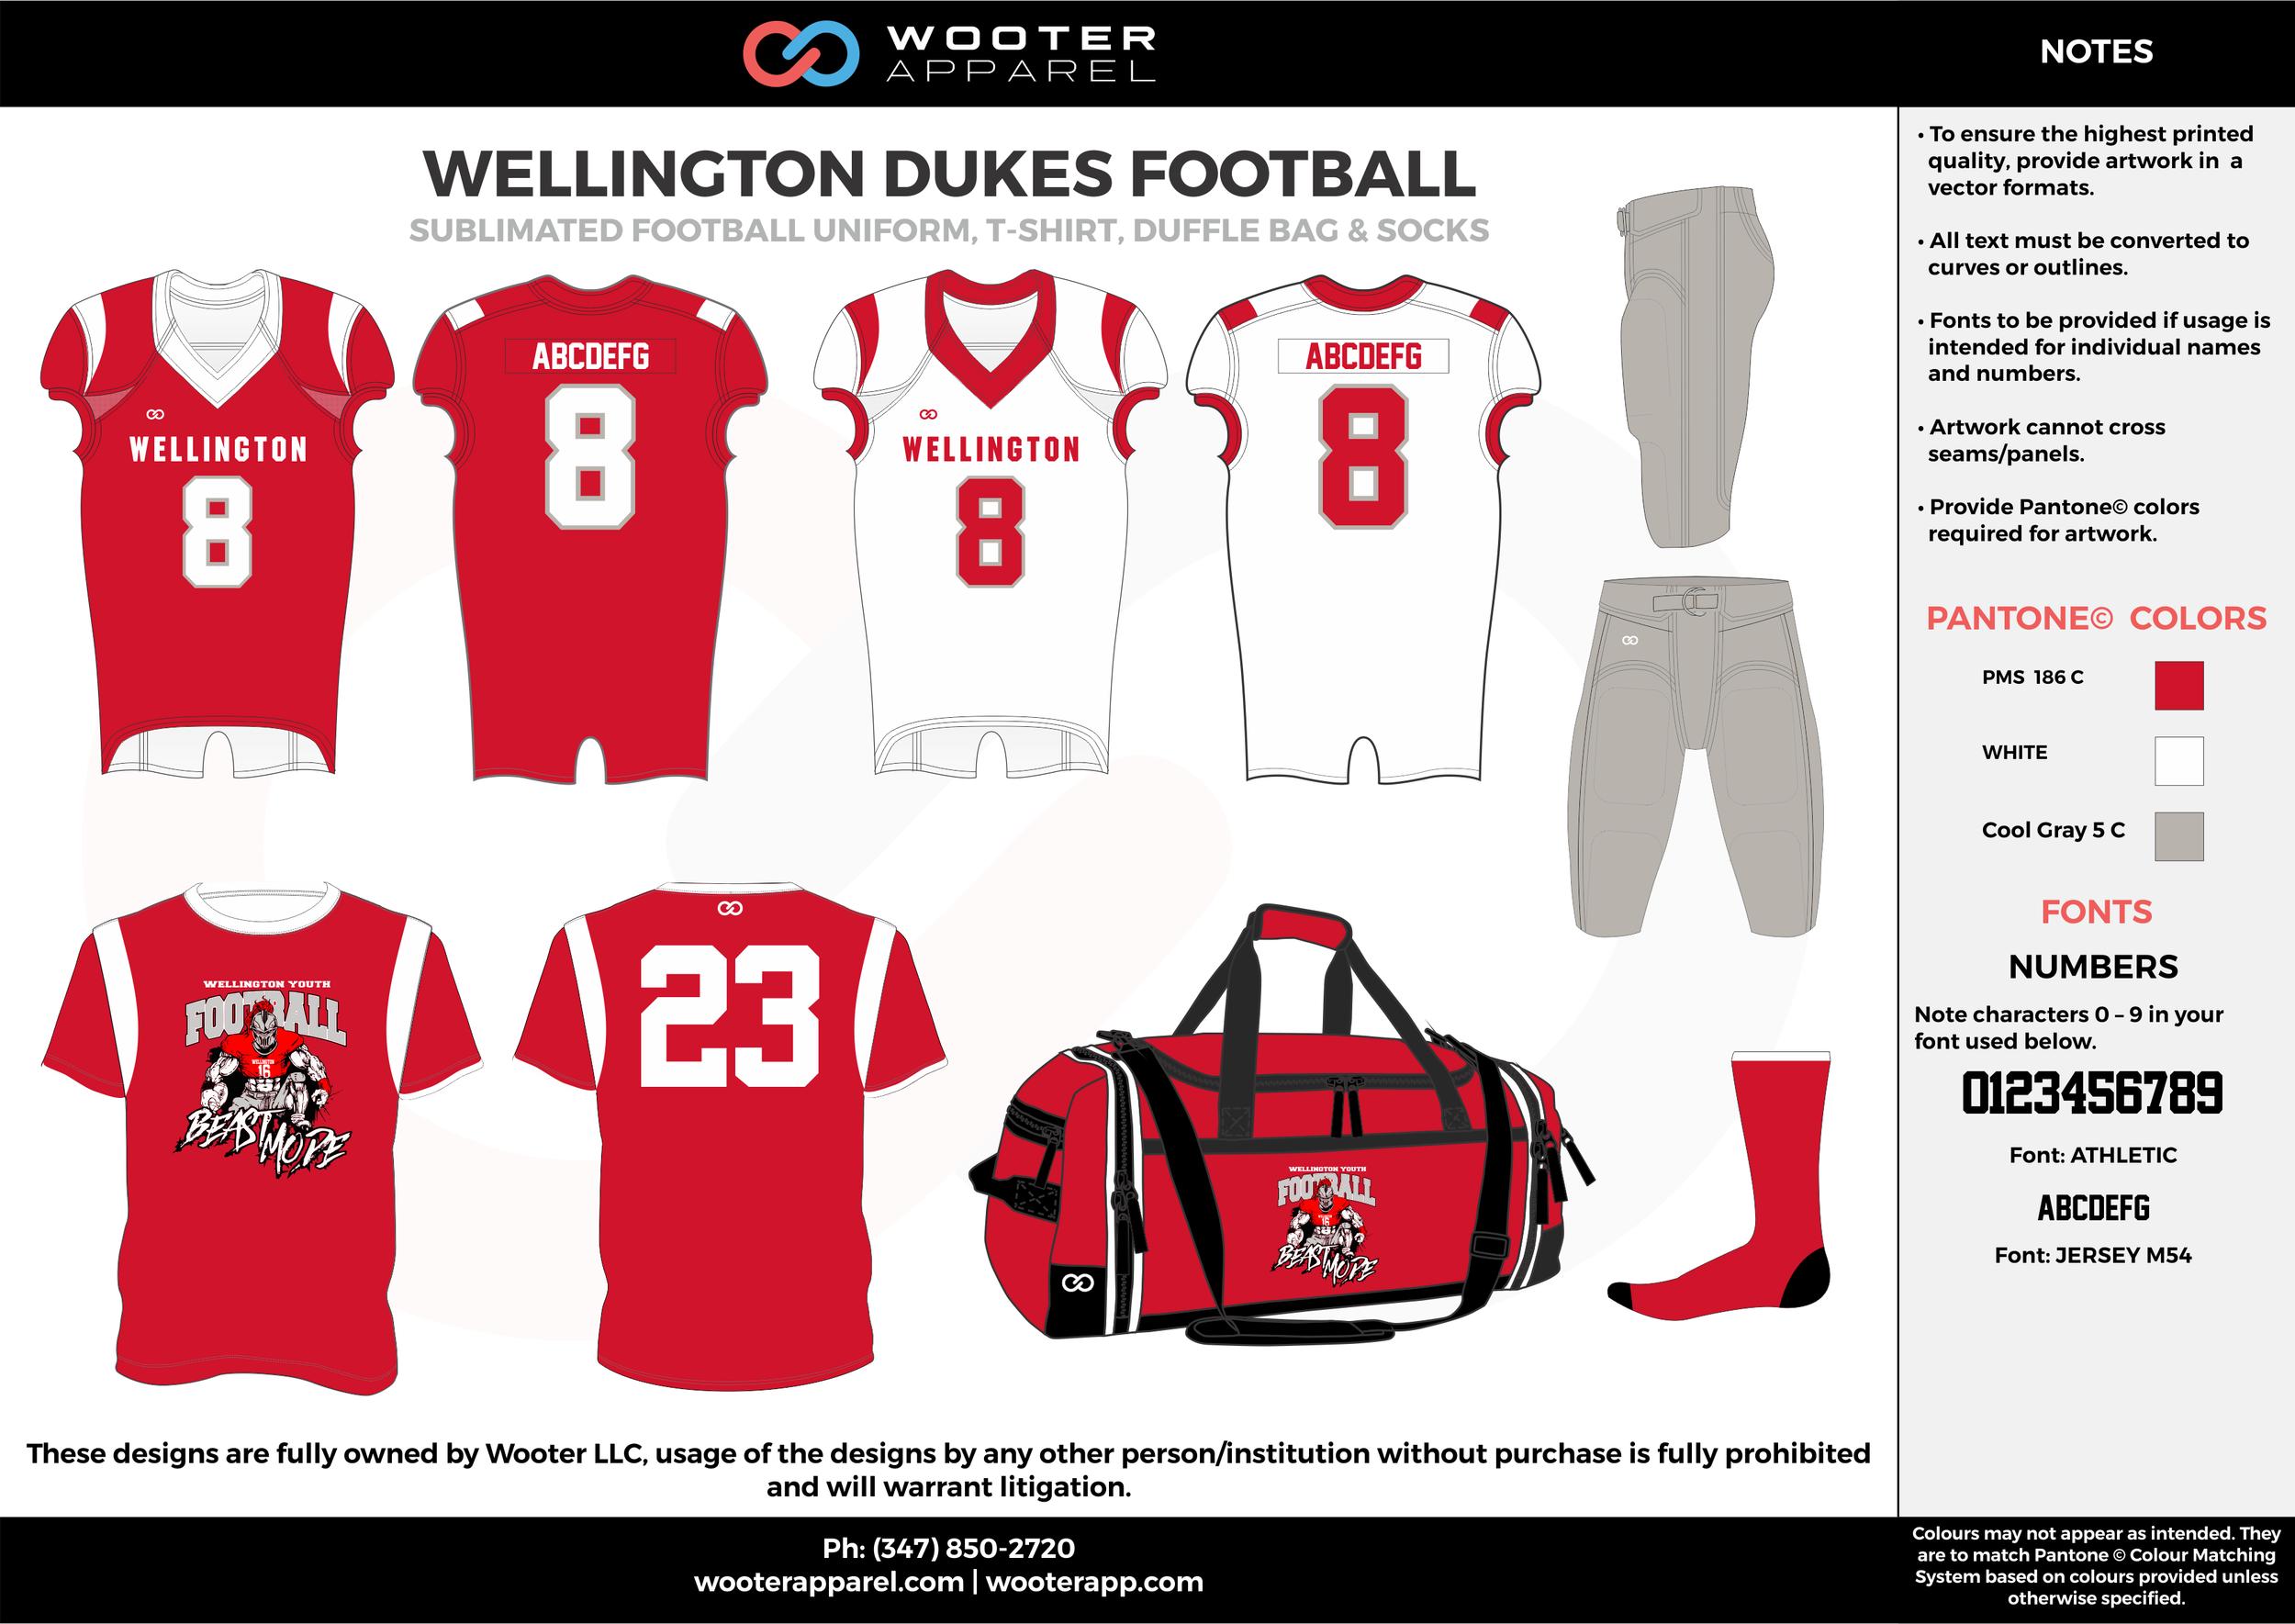 WELLINGTON DUKES FOOTBALL red white gray football uniforms jerseys pants bags socks